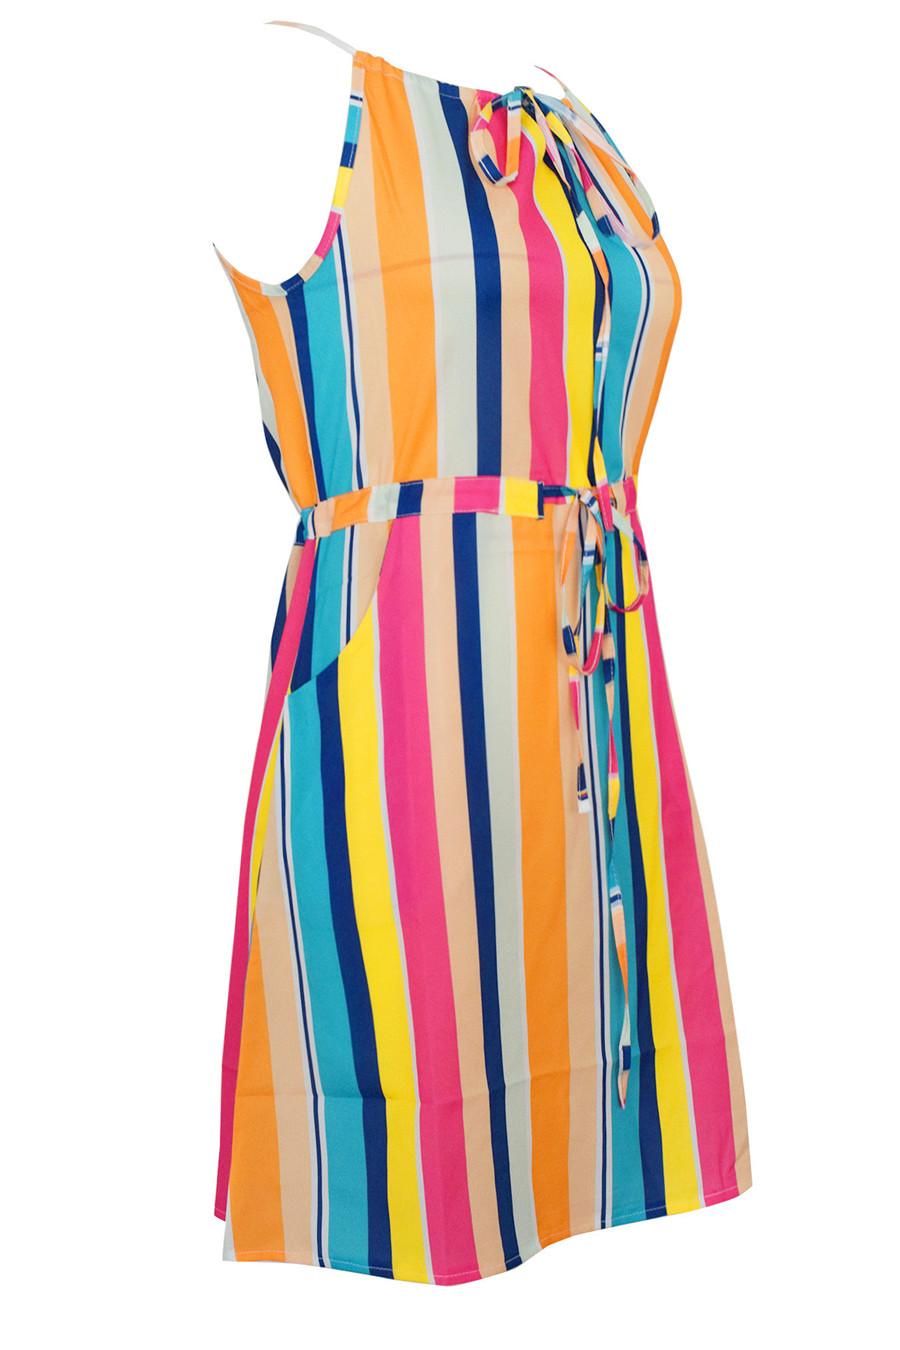 Gladiolus Chiffon Women Summer Dress Spaghetti Strap Floral Print Pocket Sexy Bohemian Beach Dress 2019 Short Ladies Dresses (25)